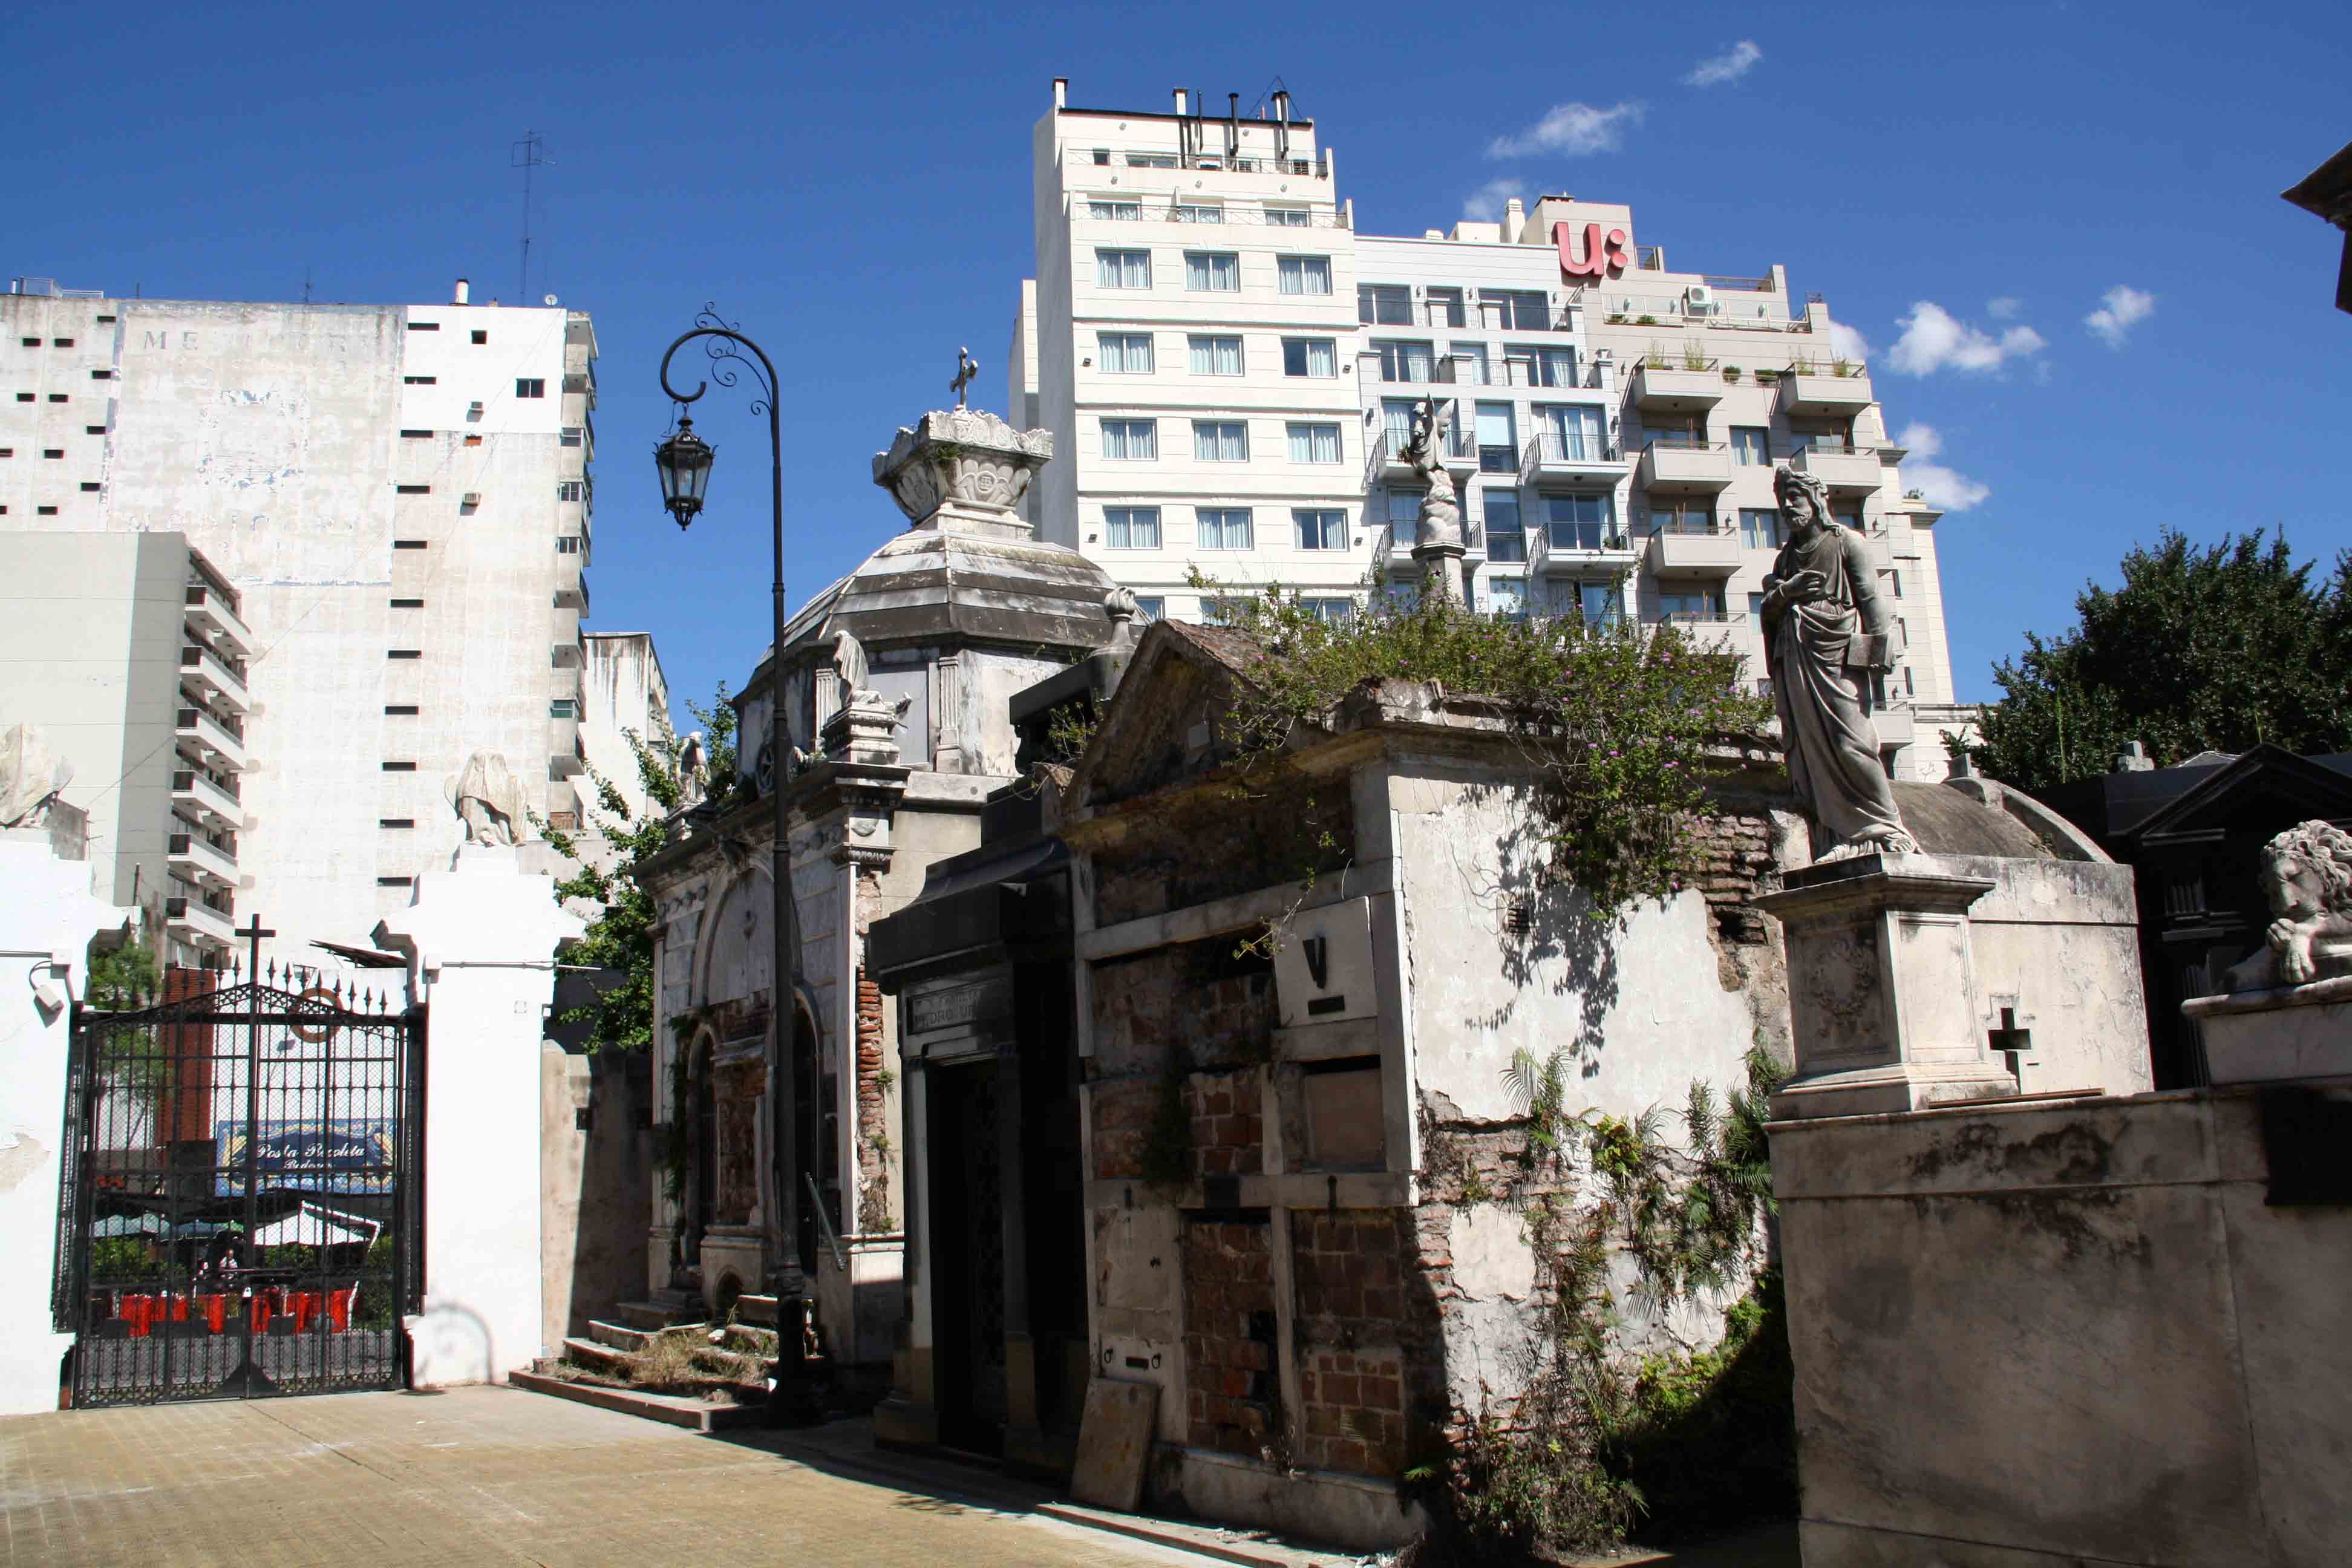 Tomb Eva Perron recoleta cemetery Buenos Aires